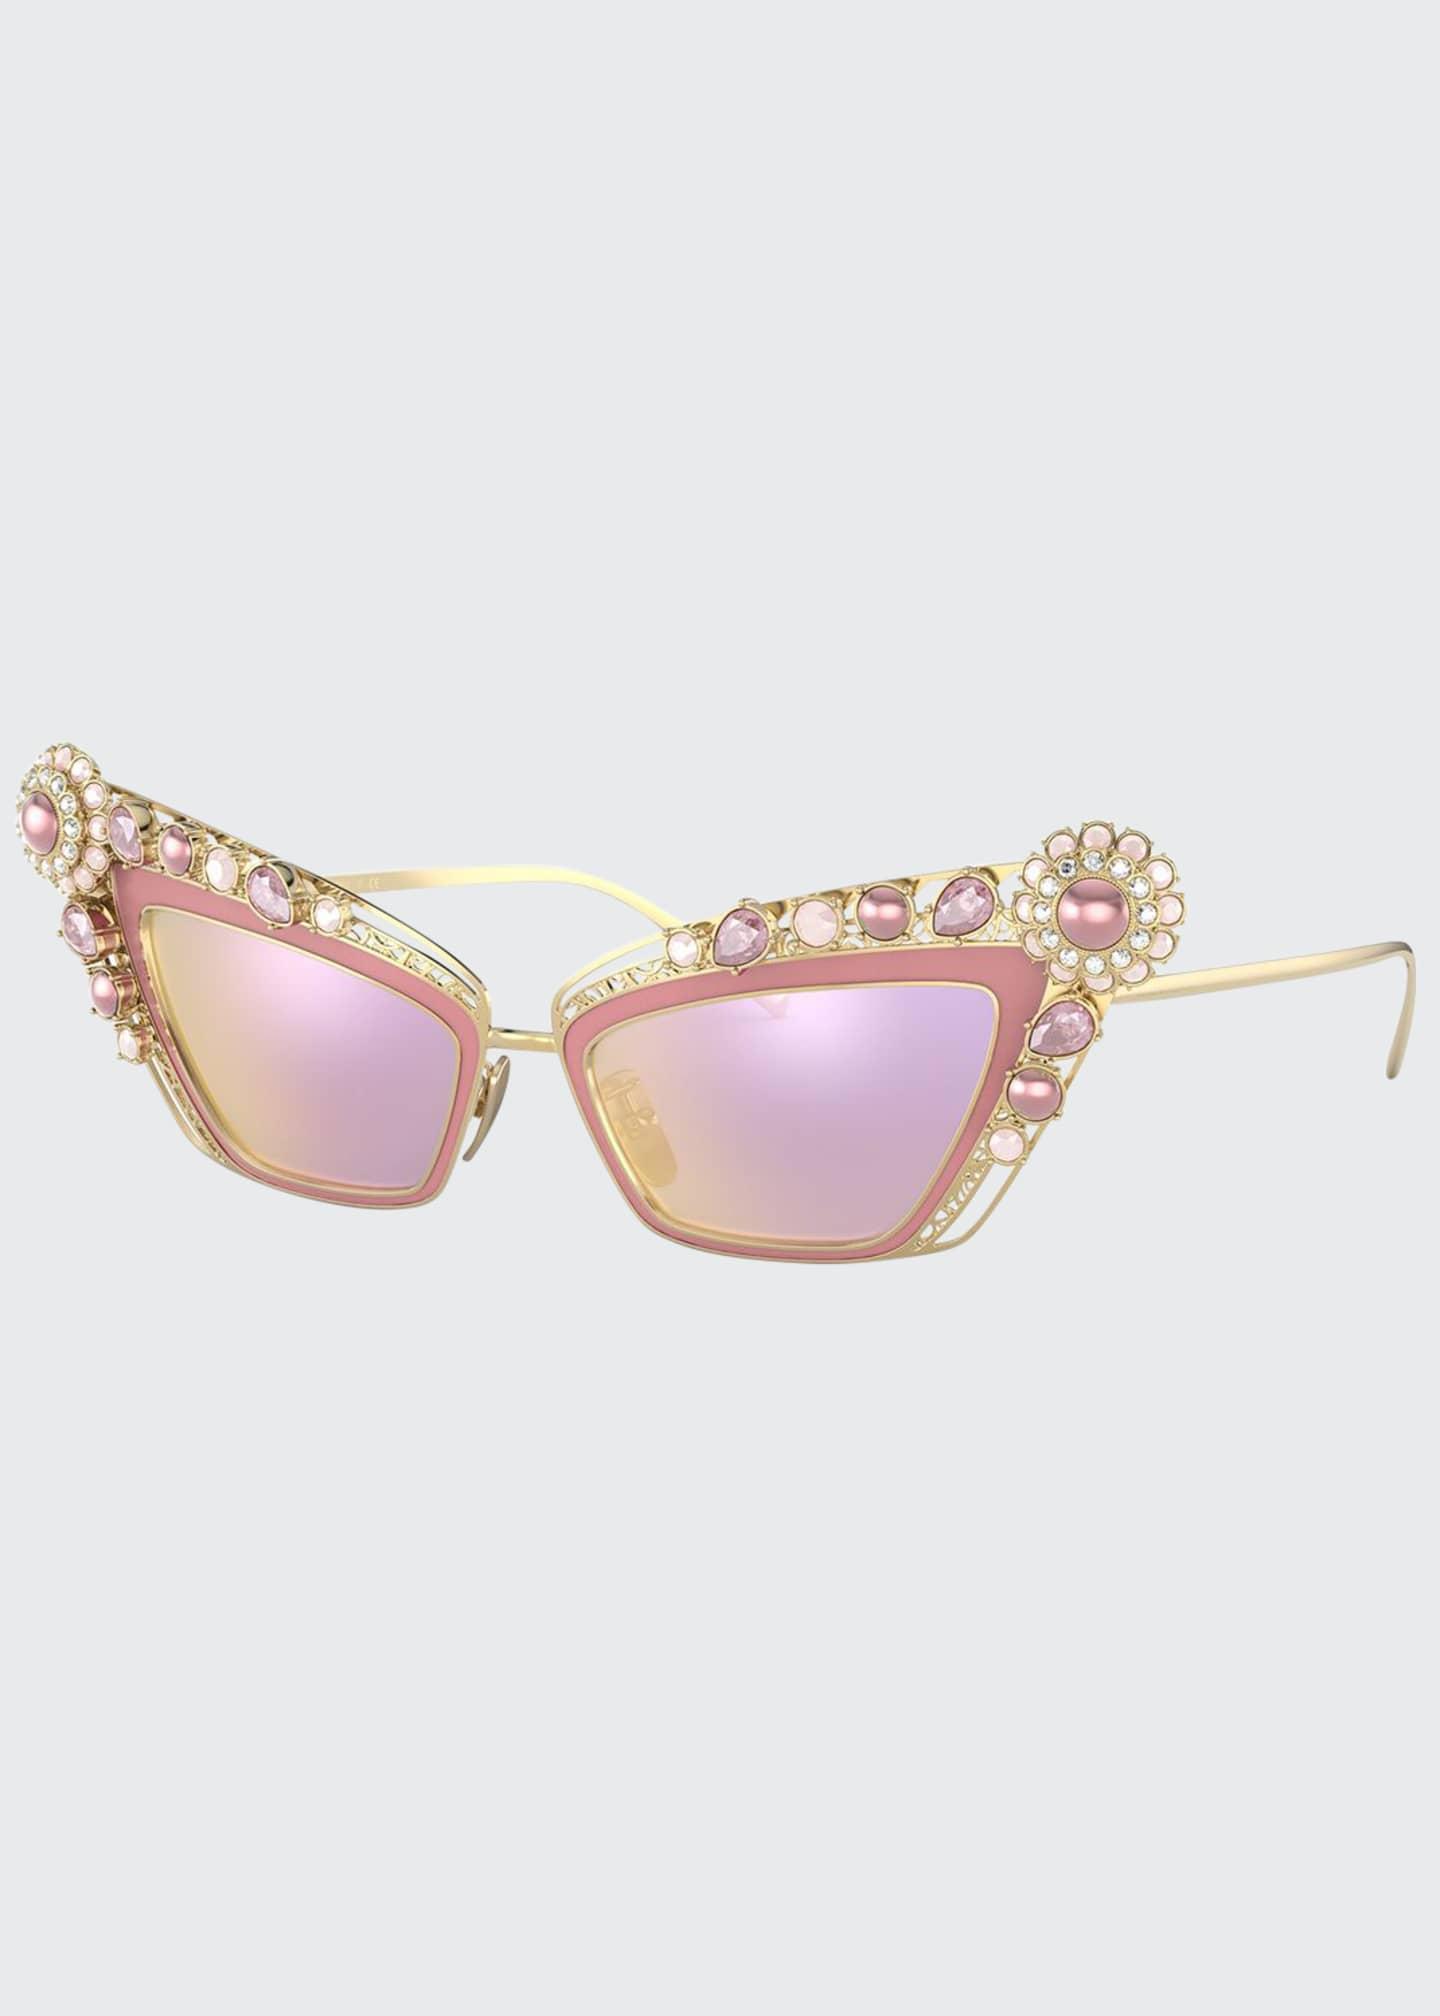 Dolce & Gabbana Crystal Embellished Cat-Eye Sunglasses